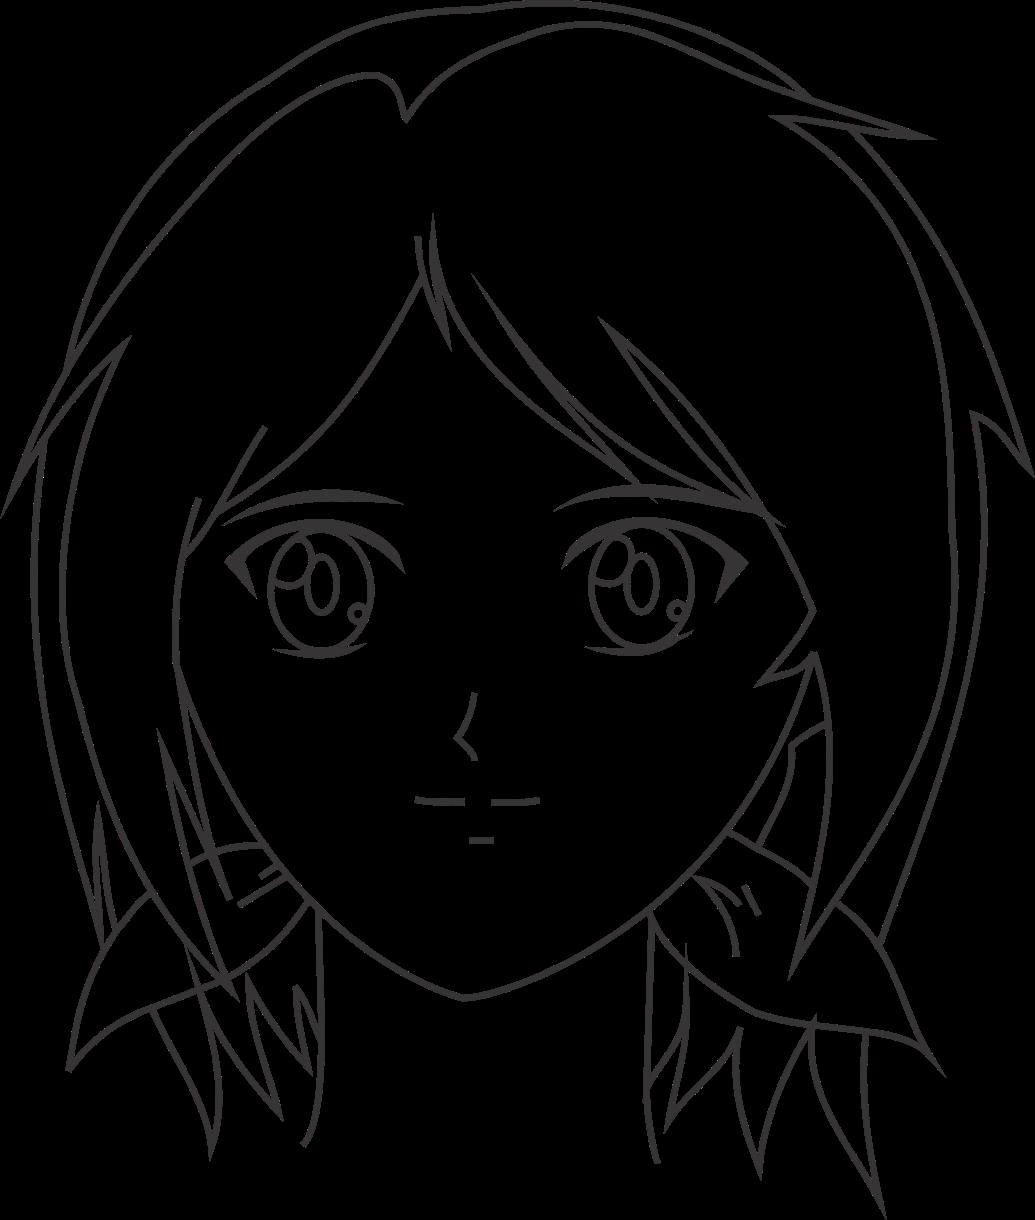 Cara menggambar wajah anime